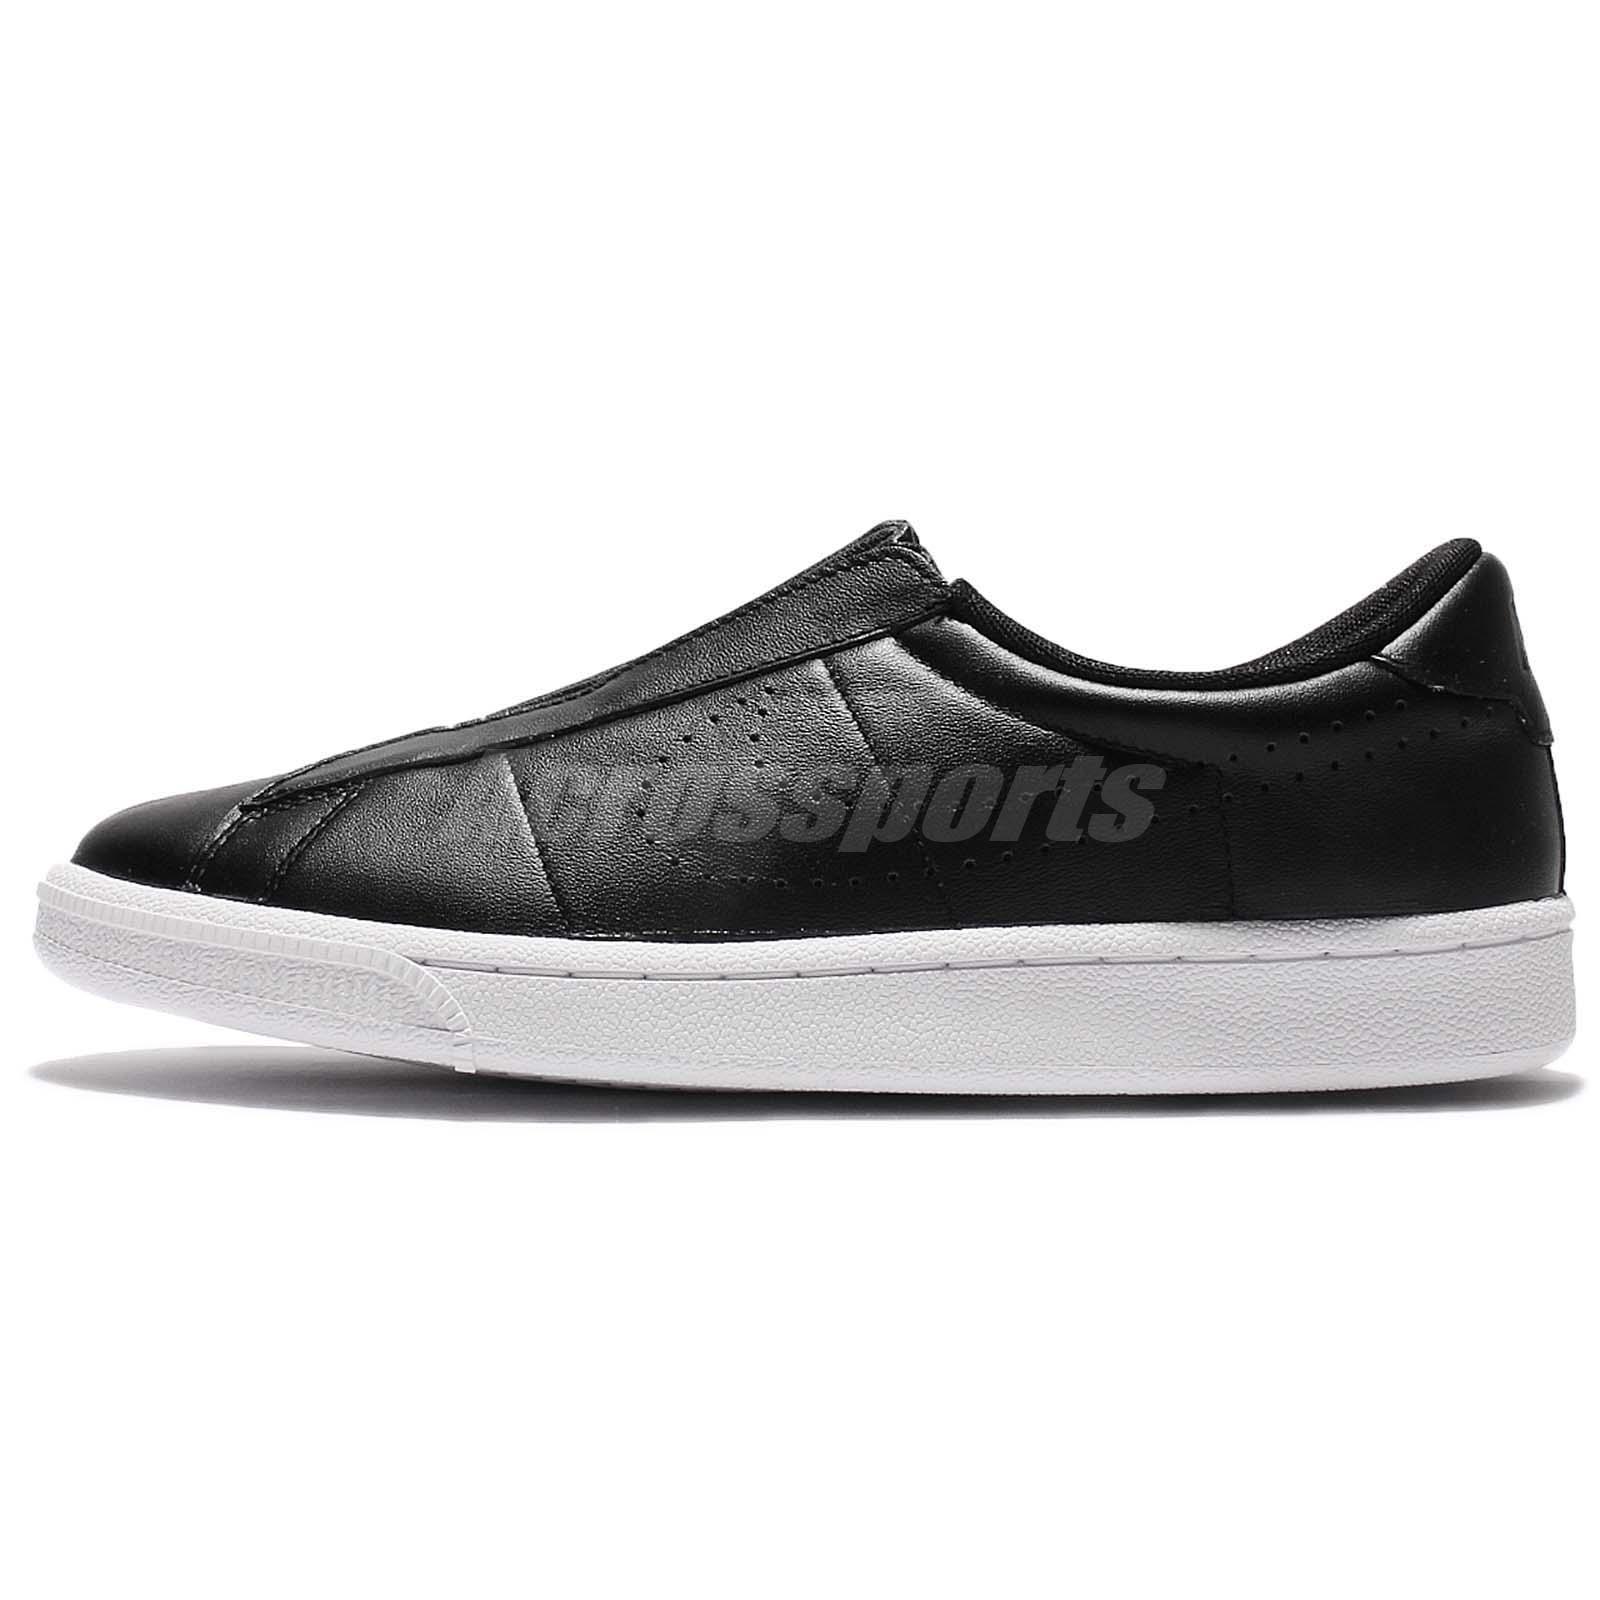 f74610cc843862 ... Wmns Nike Tennis Classic Ease Black Leather Women Shoes Slip-On NSW  896504-001  Nike Mens ...